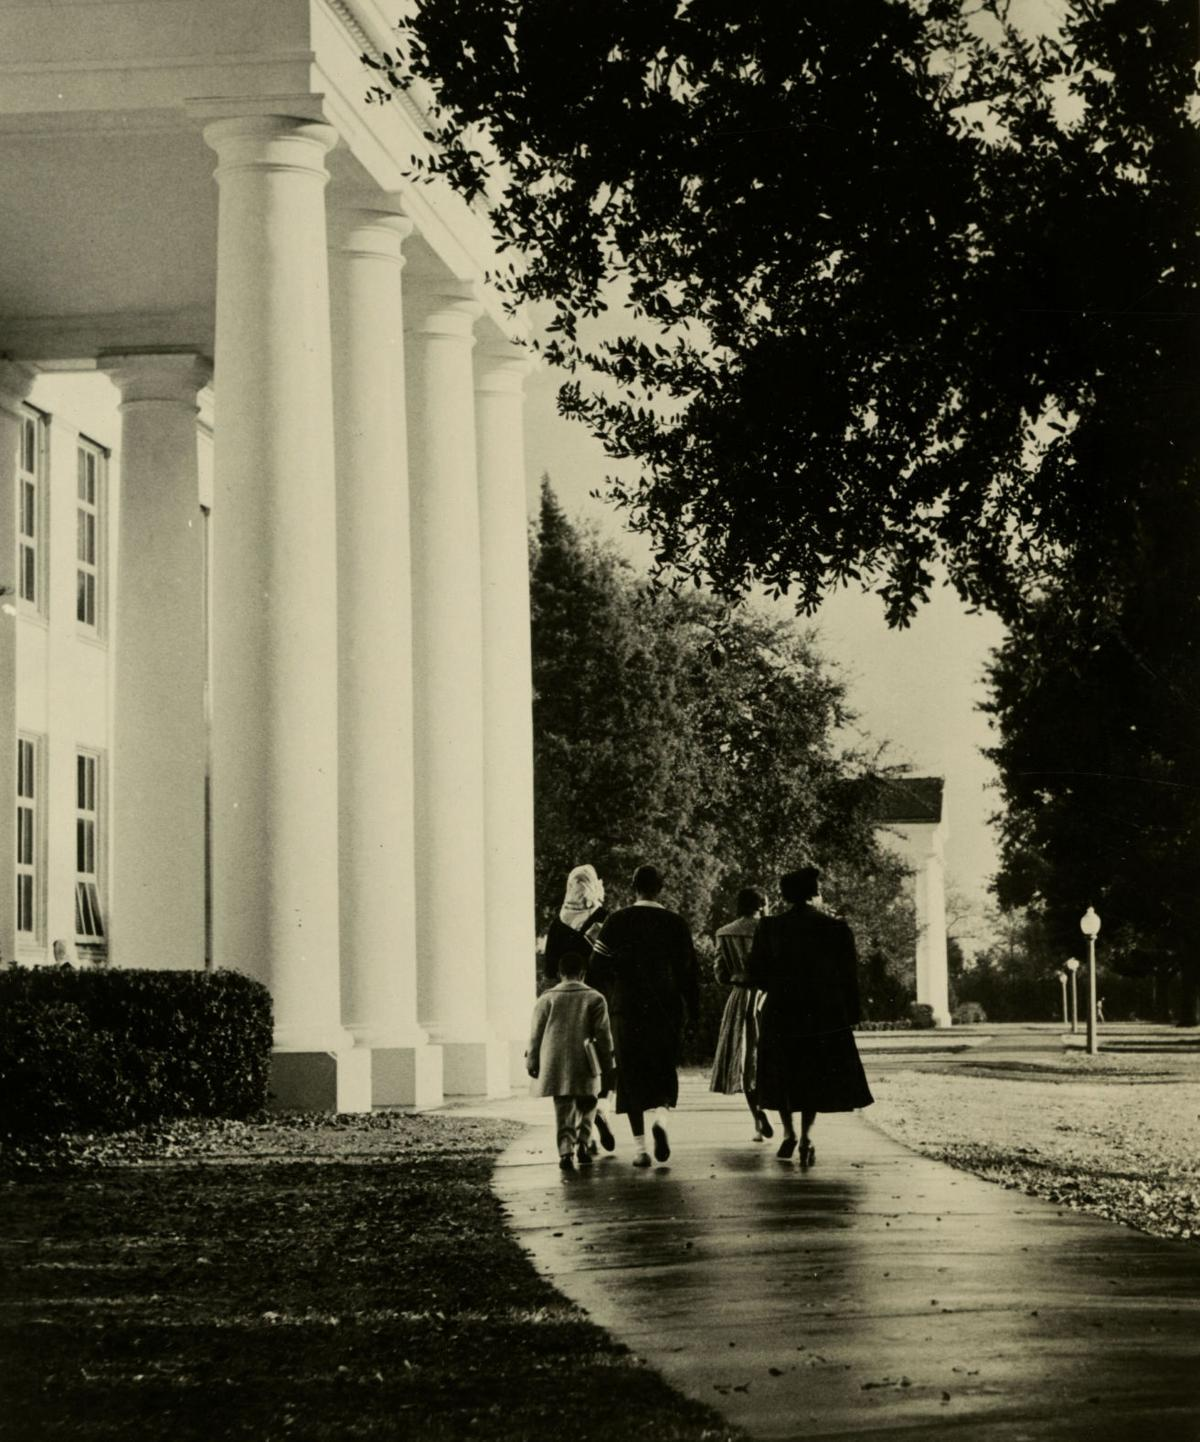 c761c1a8323b6 Dillard University looks to the future as it celebrates 150 years in ...